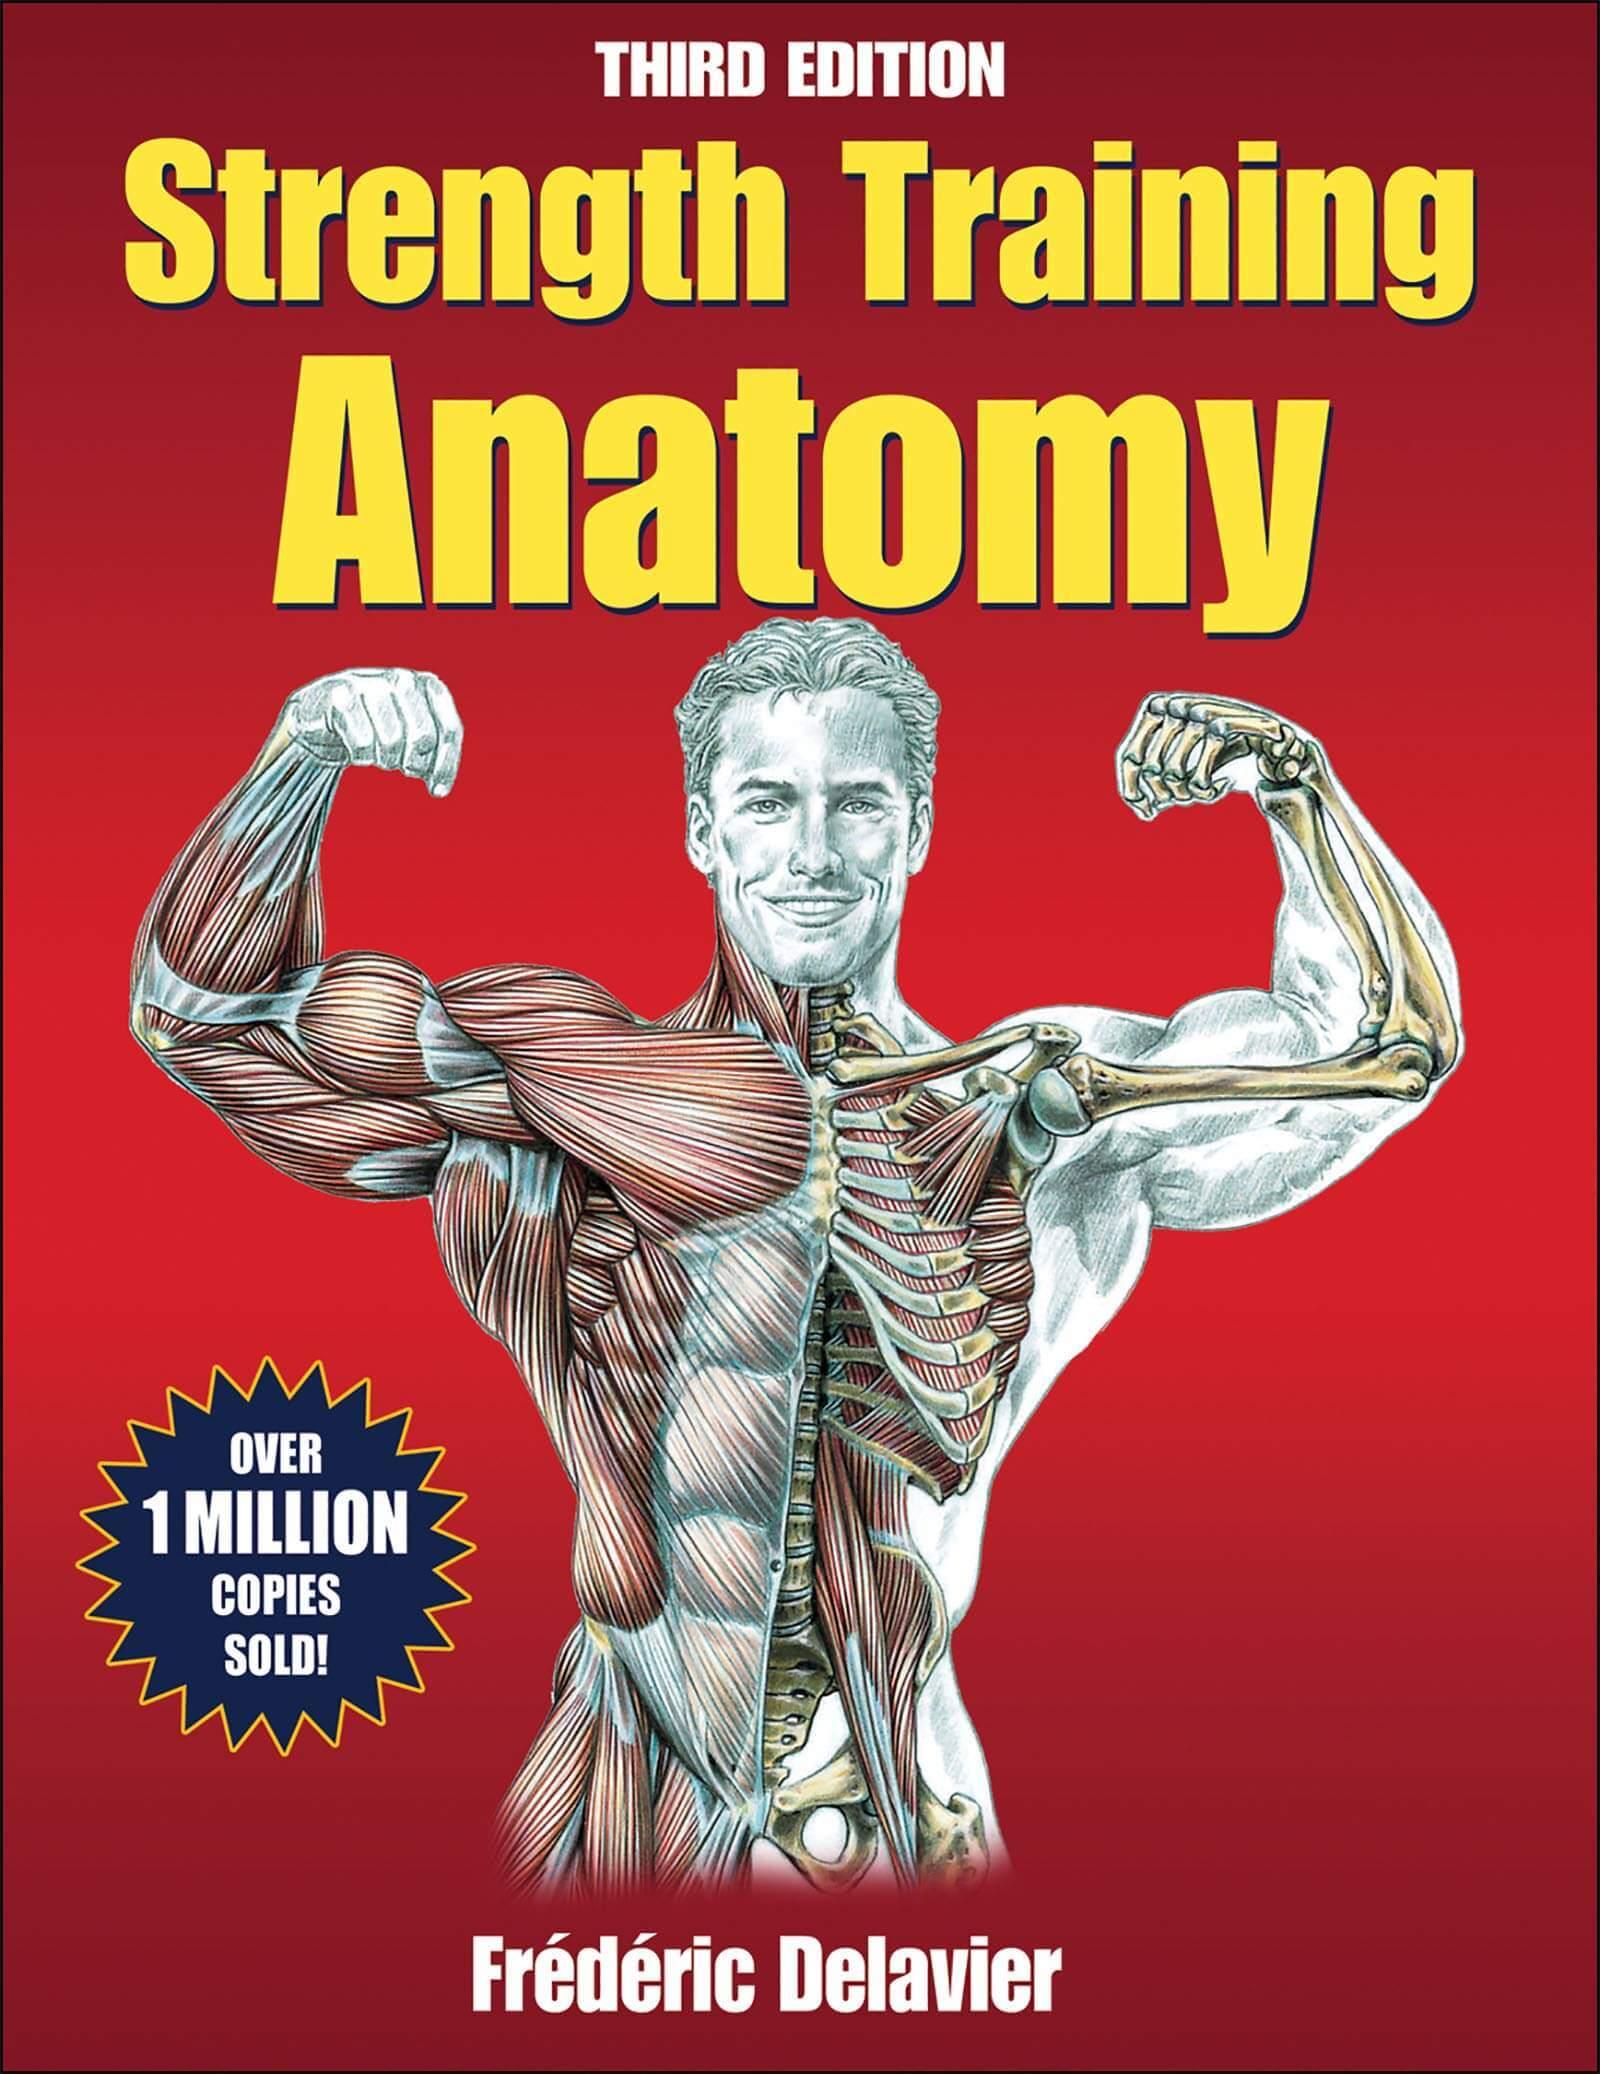 Strength Training Anatomy - Frederic Delavier, July 2021